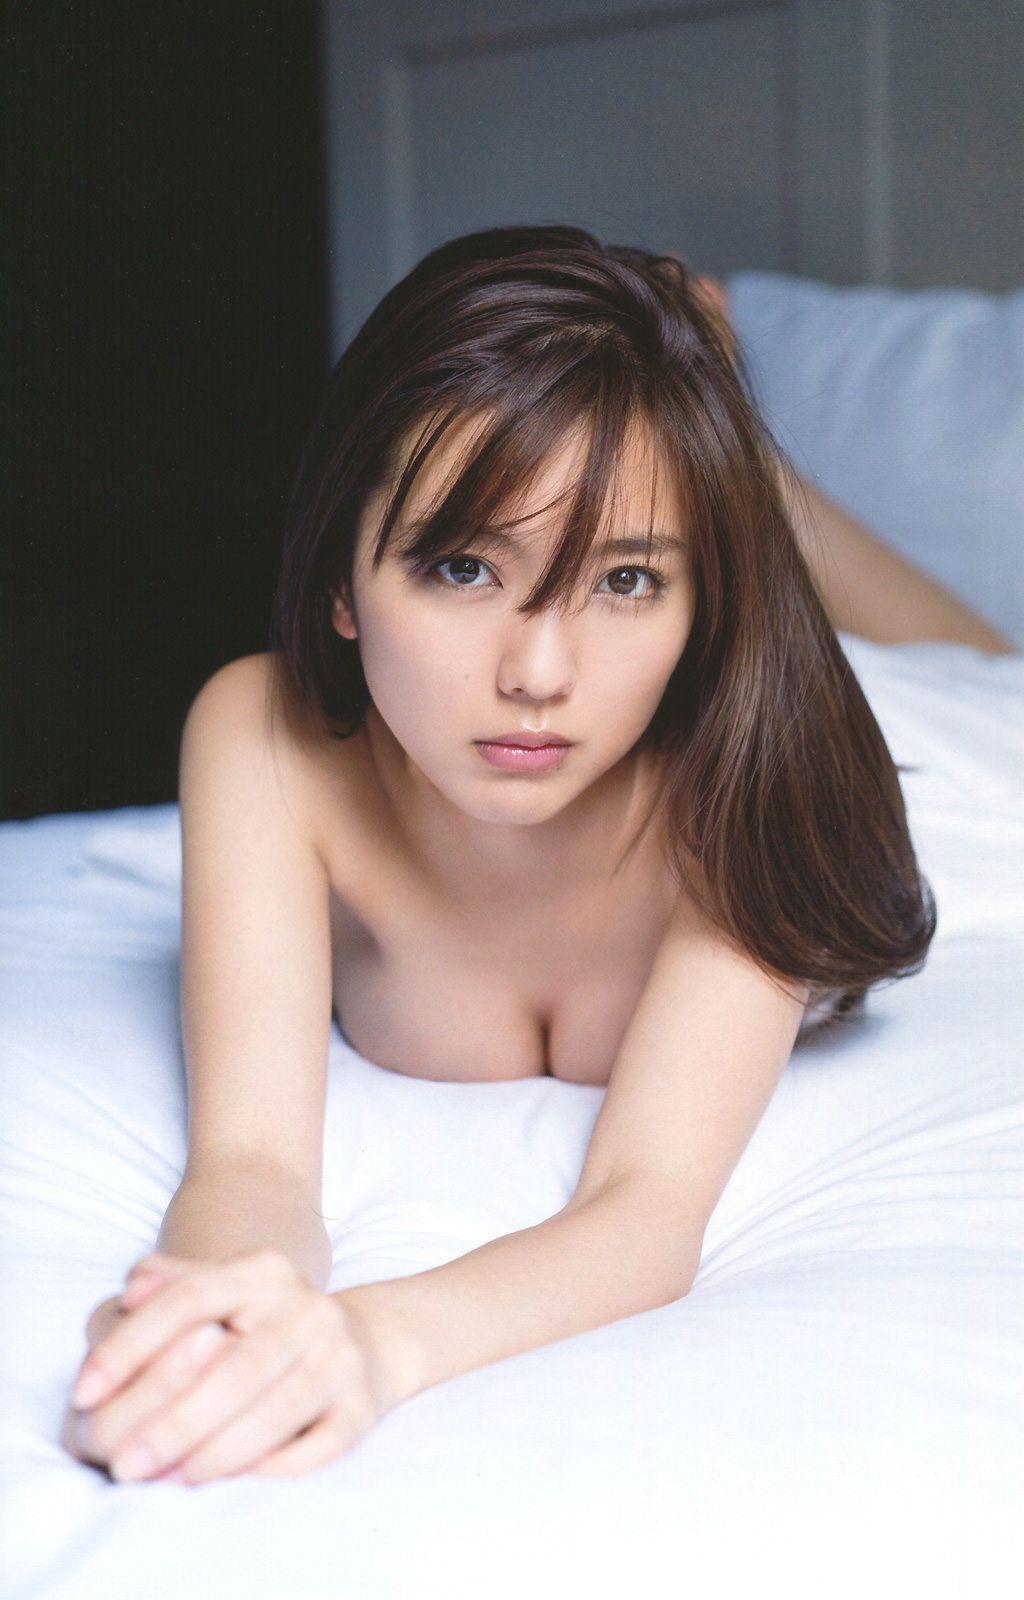 Model Jepang Paling Cantik dan Seksi, Saingan Artis JAV 5